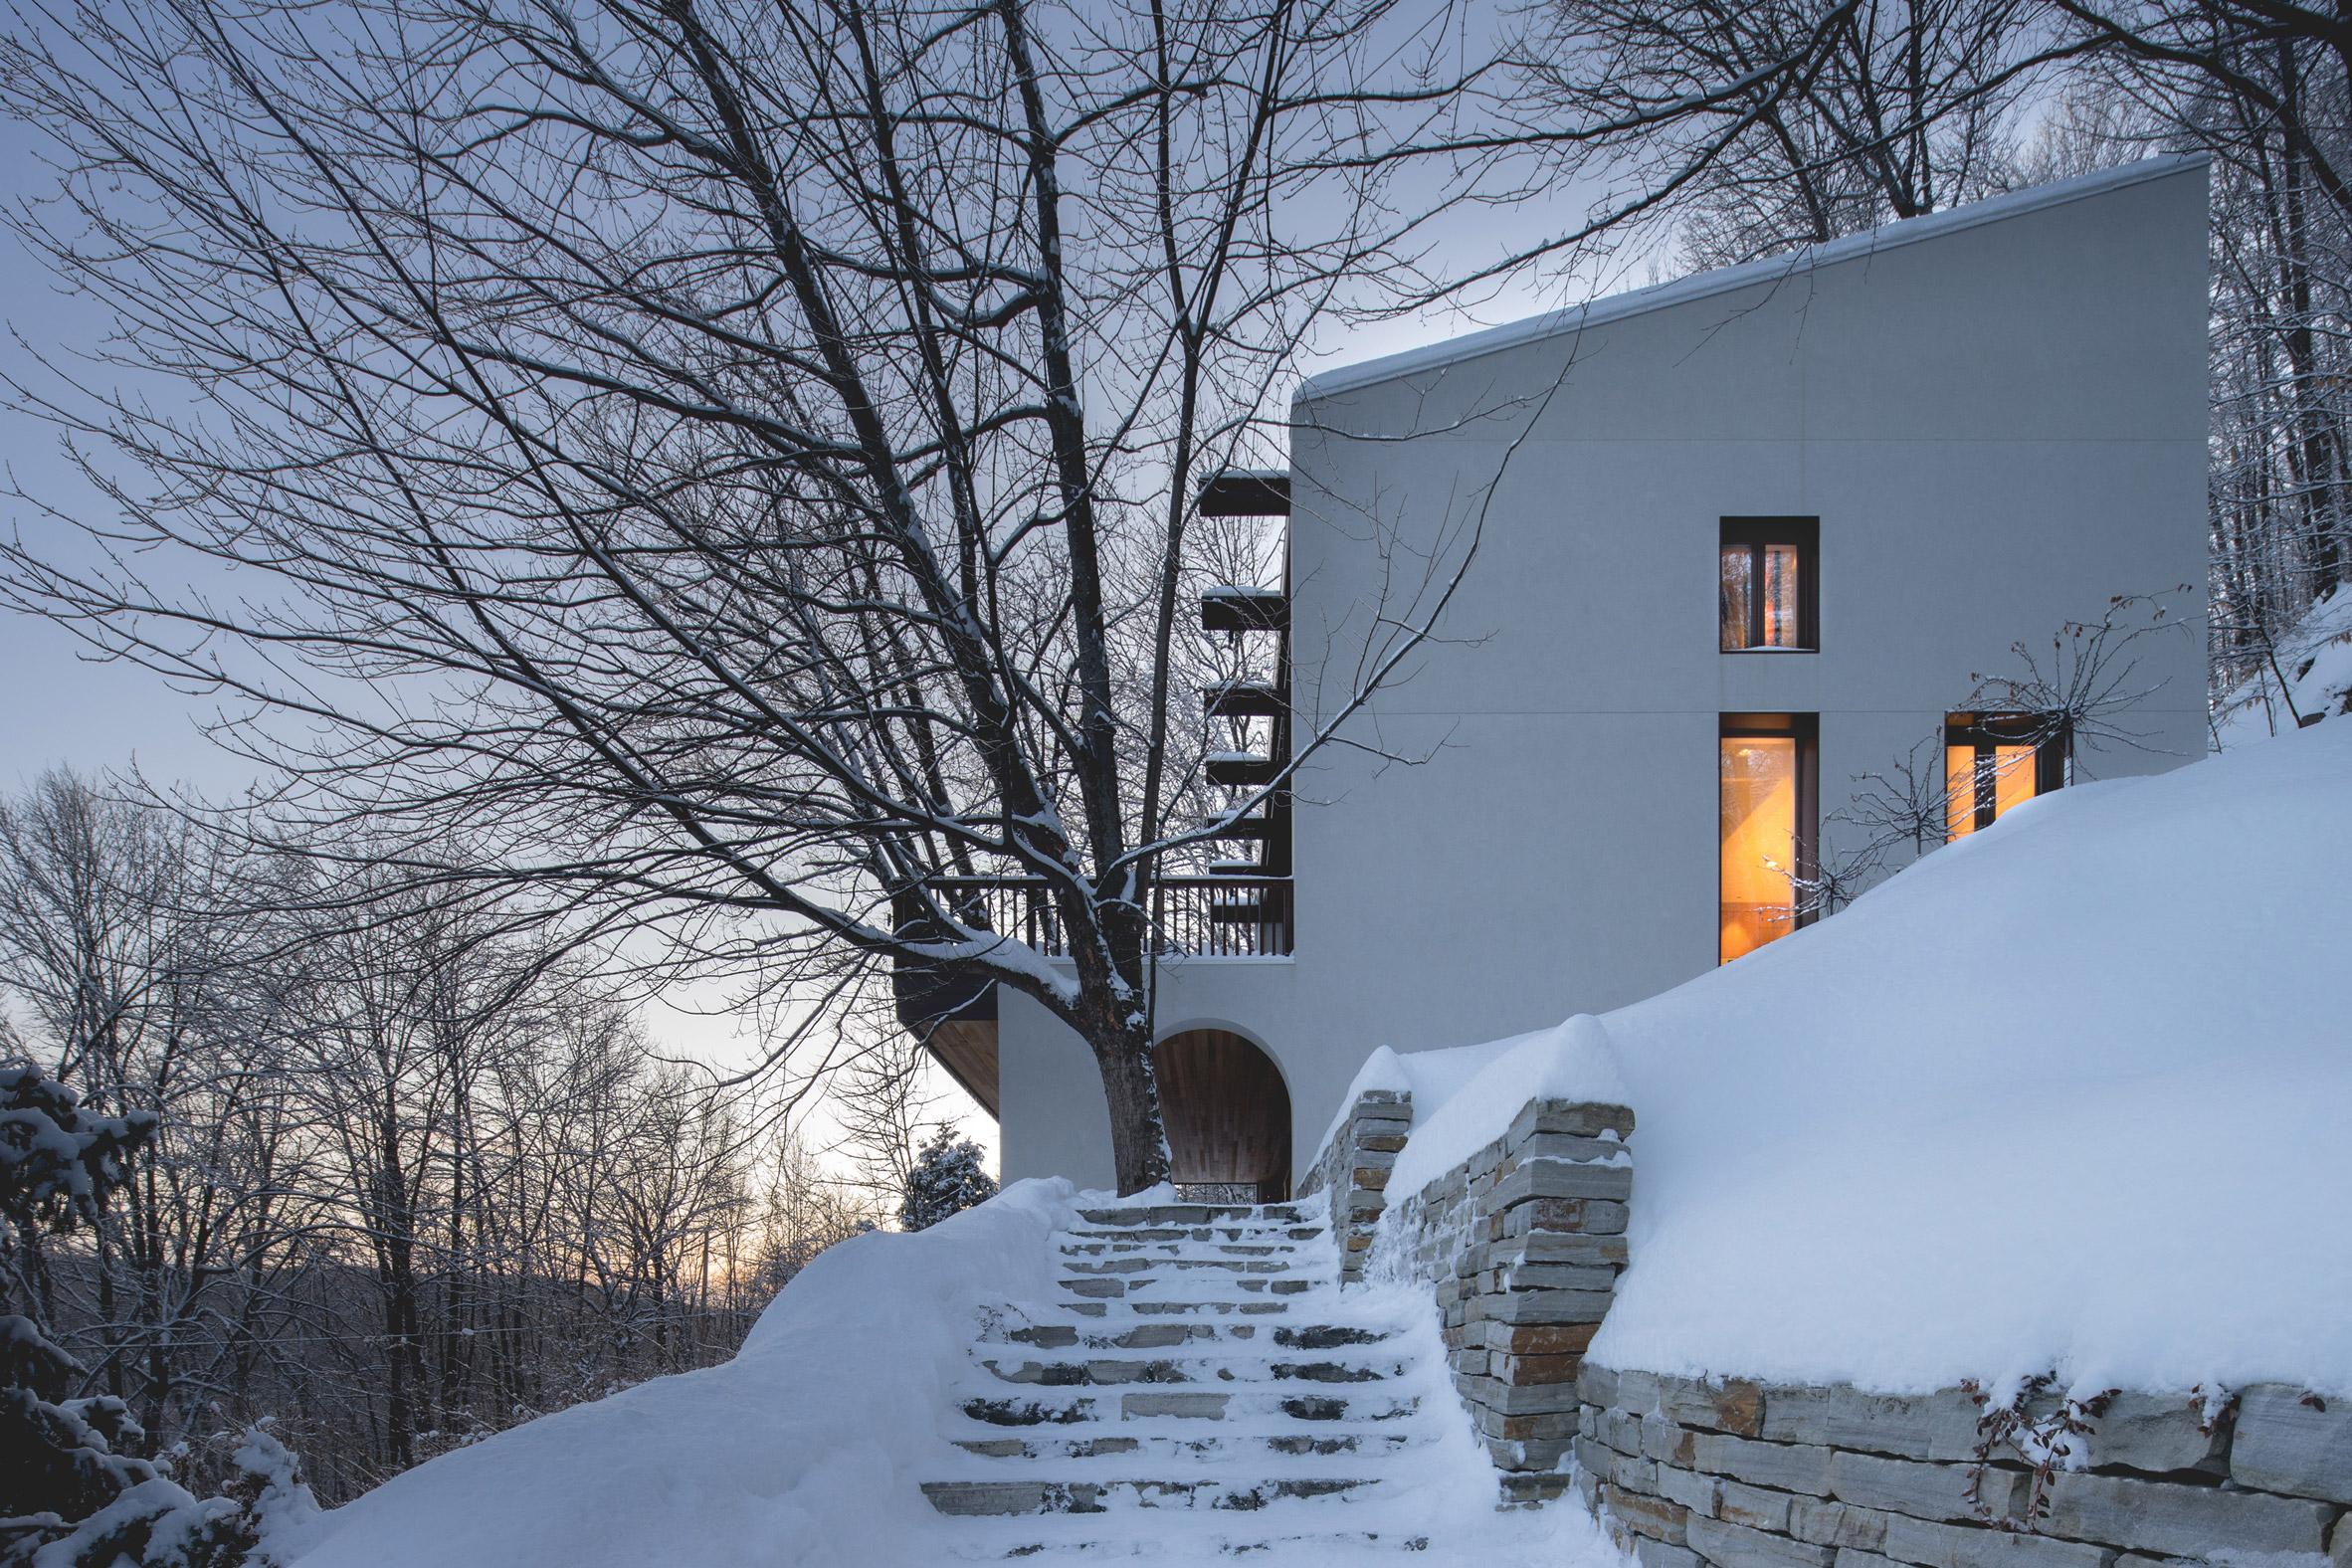 Residence Maribou by Alain Carle Architecte